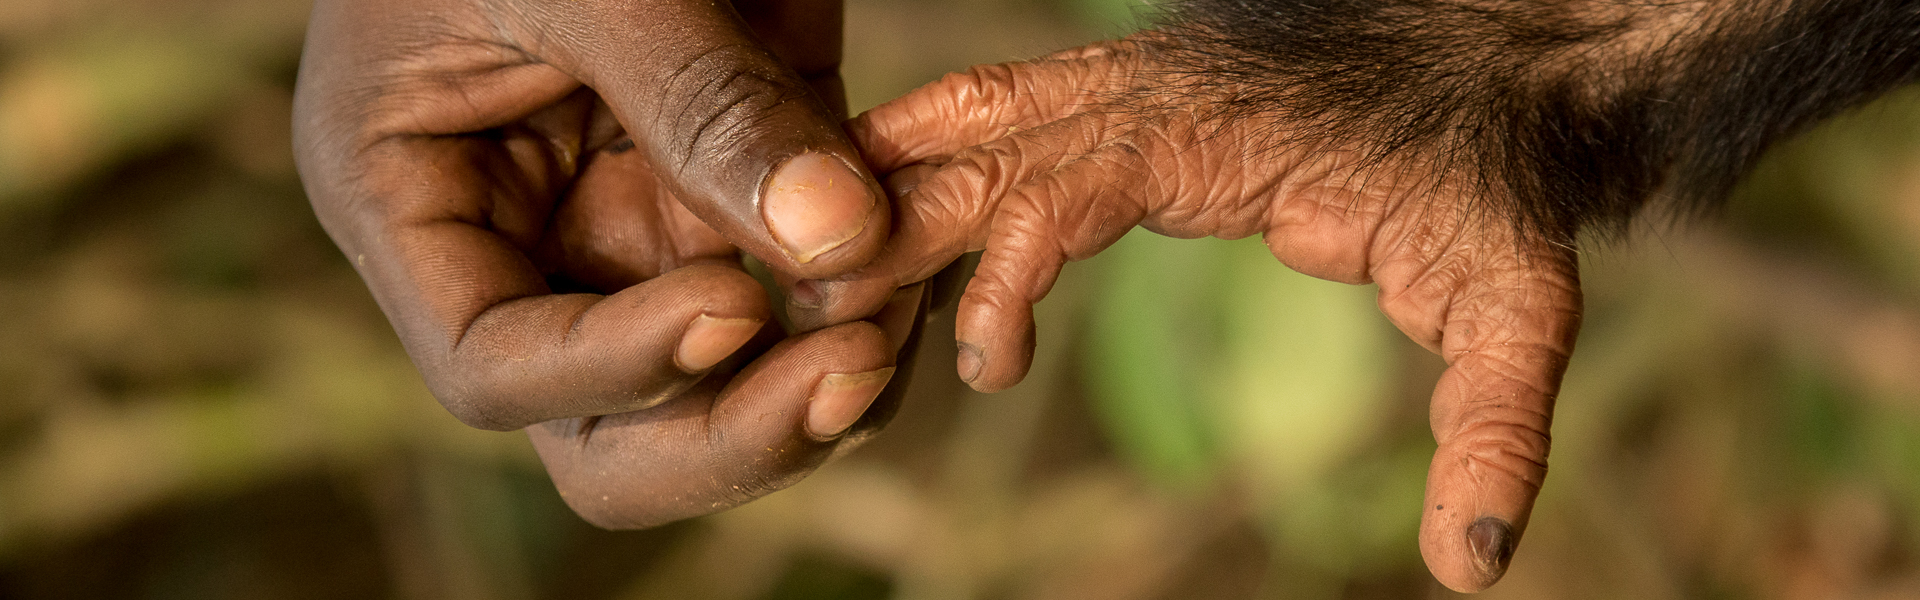 Human hand and chimpanzee foot (Pan troglodytes) captive orphan at Mefou Primate Sanctuary, Ape Action Africa, Cameroon